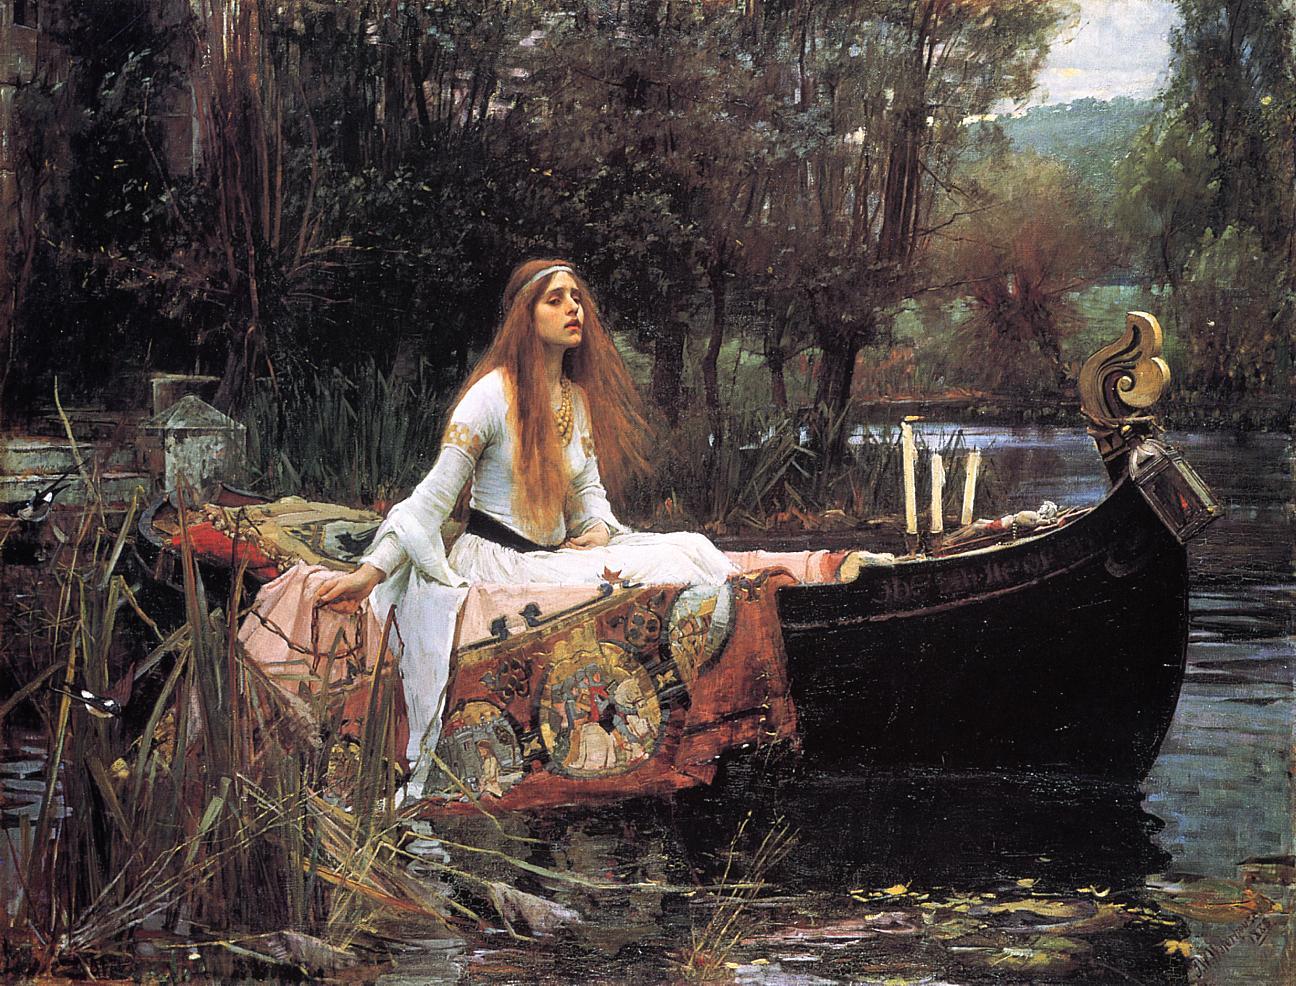 The Lady of Shallot. Obra de John William Waterhouse. 1888